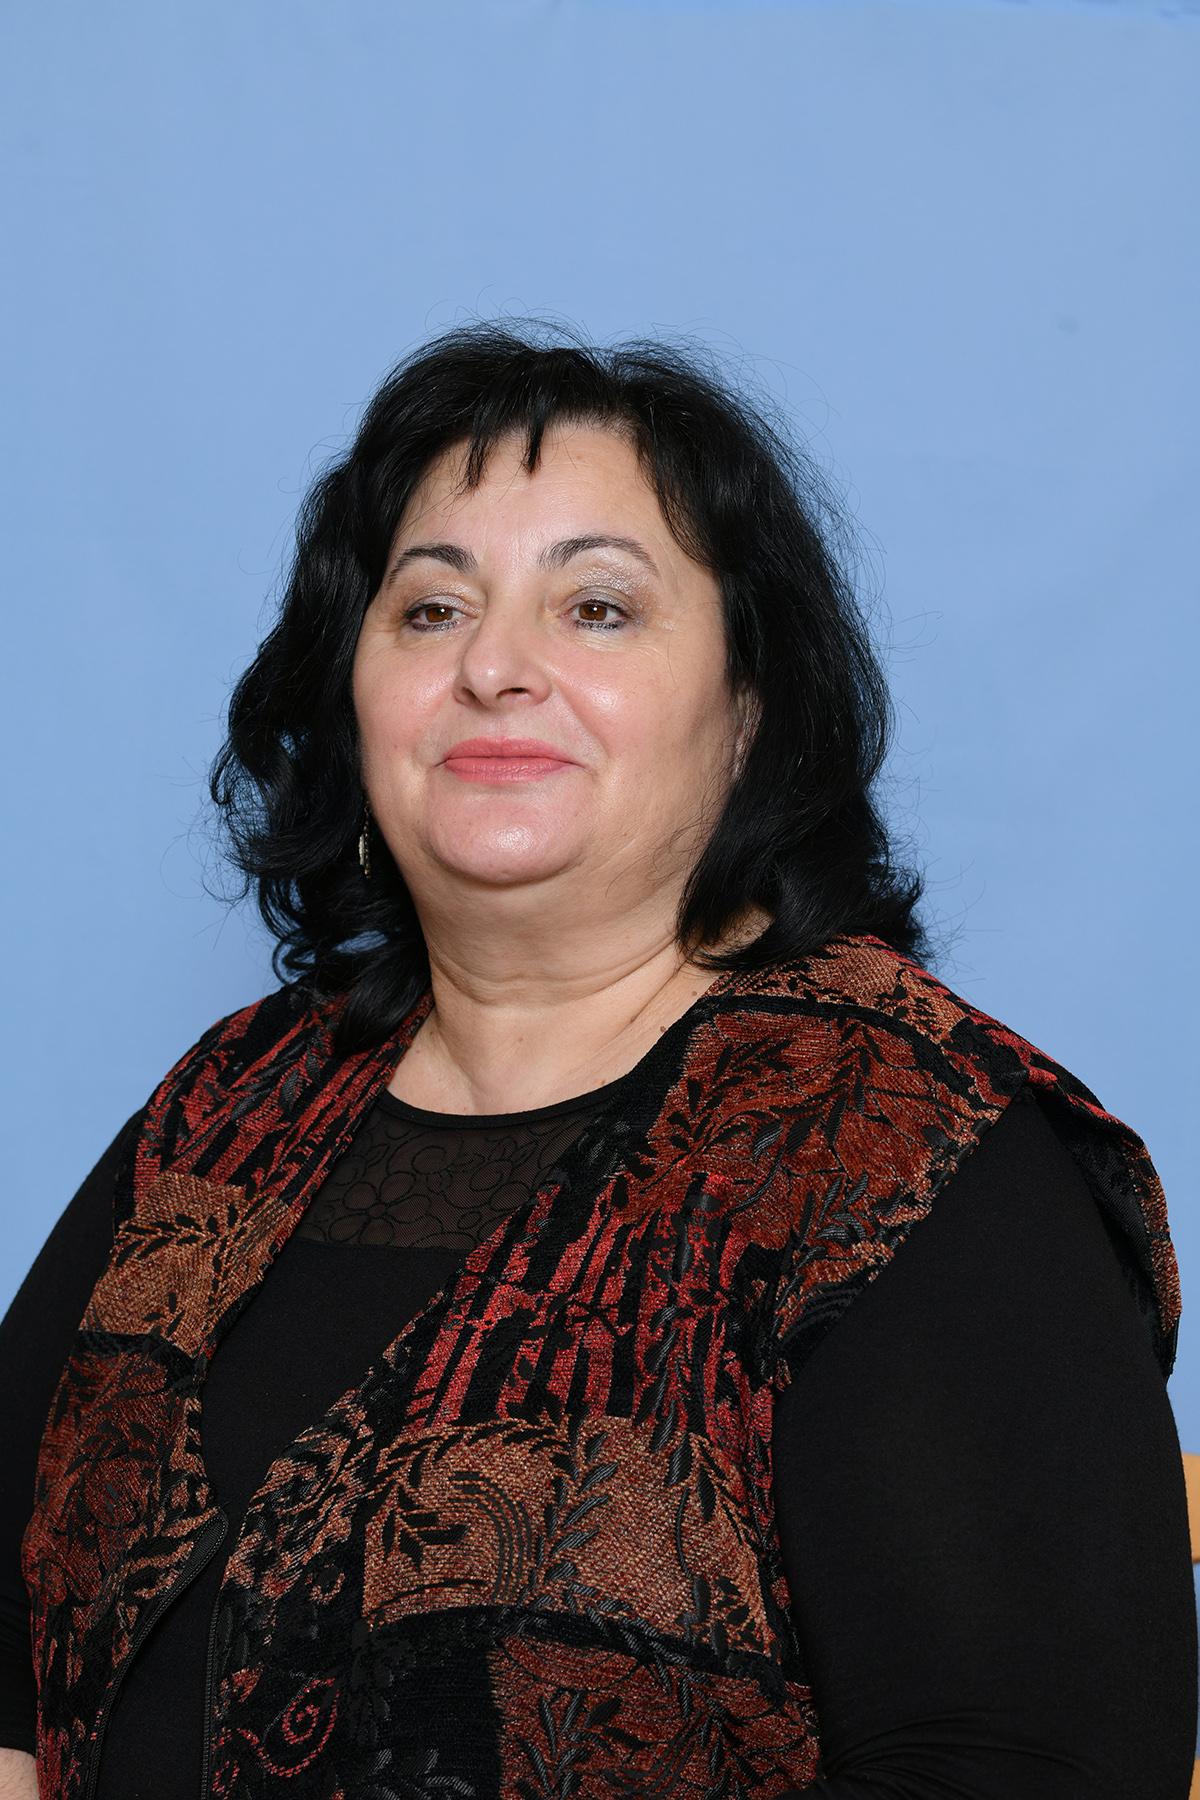 Виолета Николић